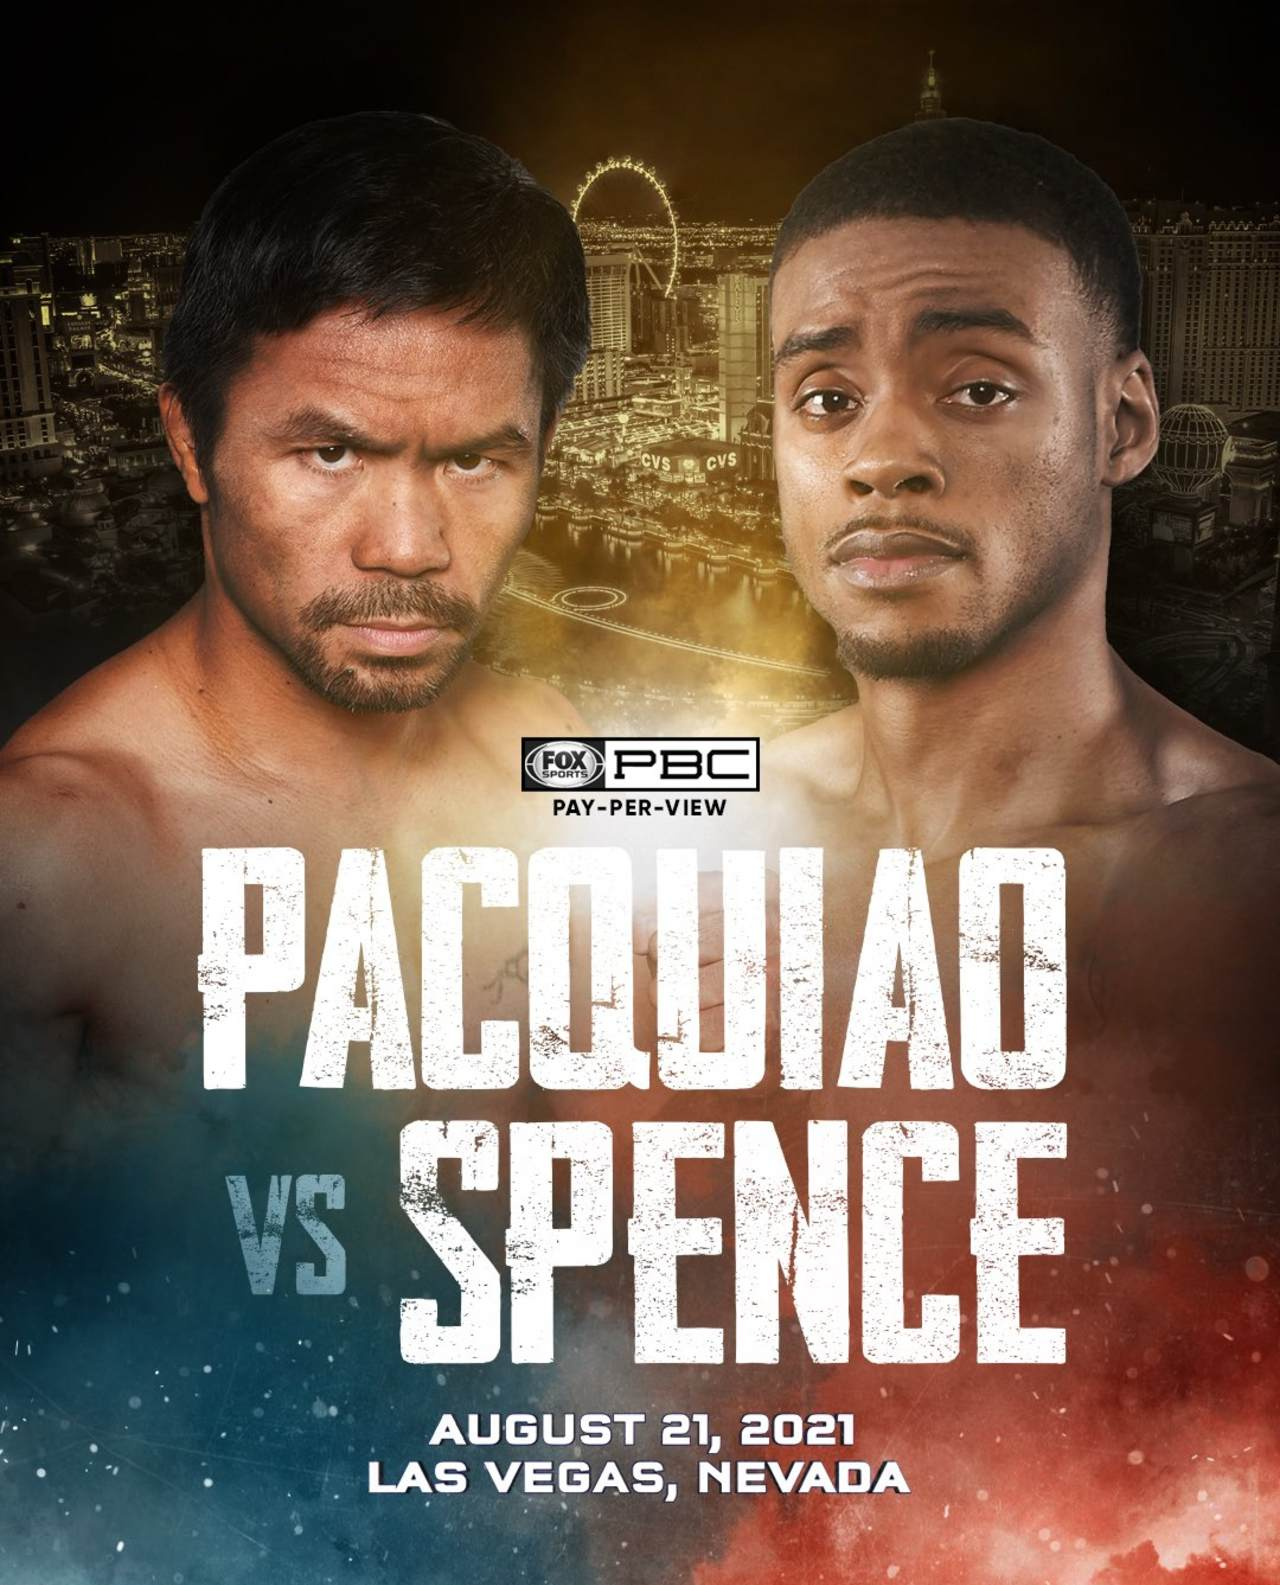 Manny Pacquiao Errol Spence Jr. enrenamiento